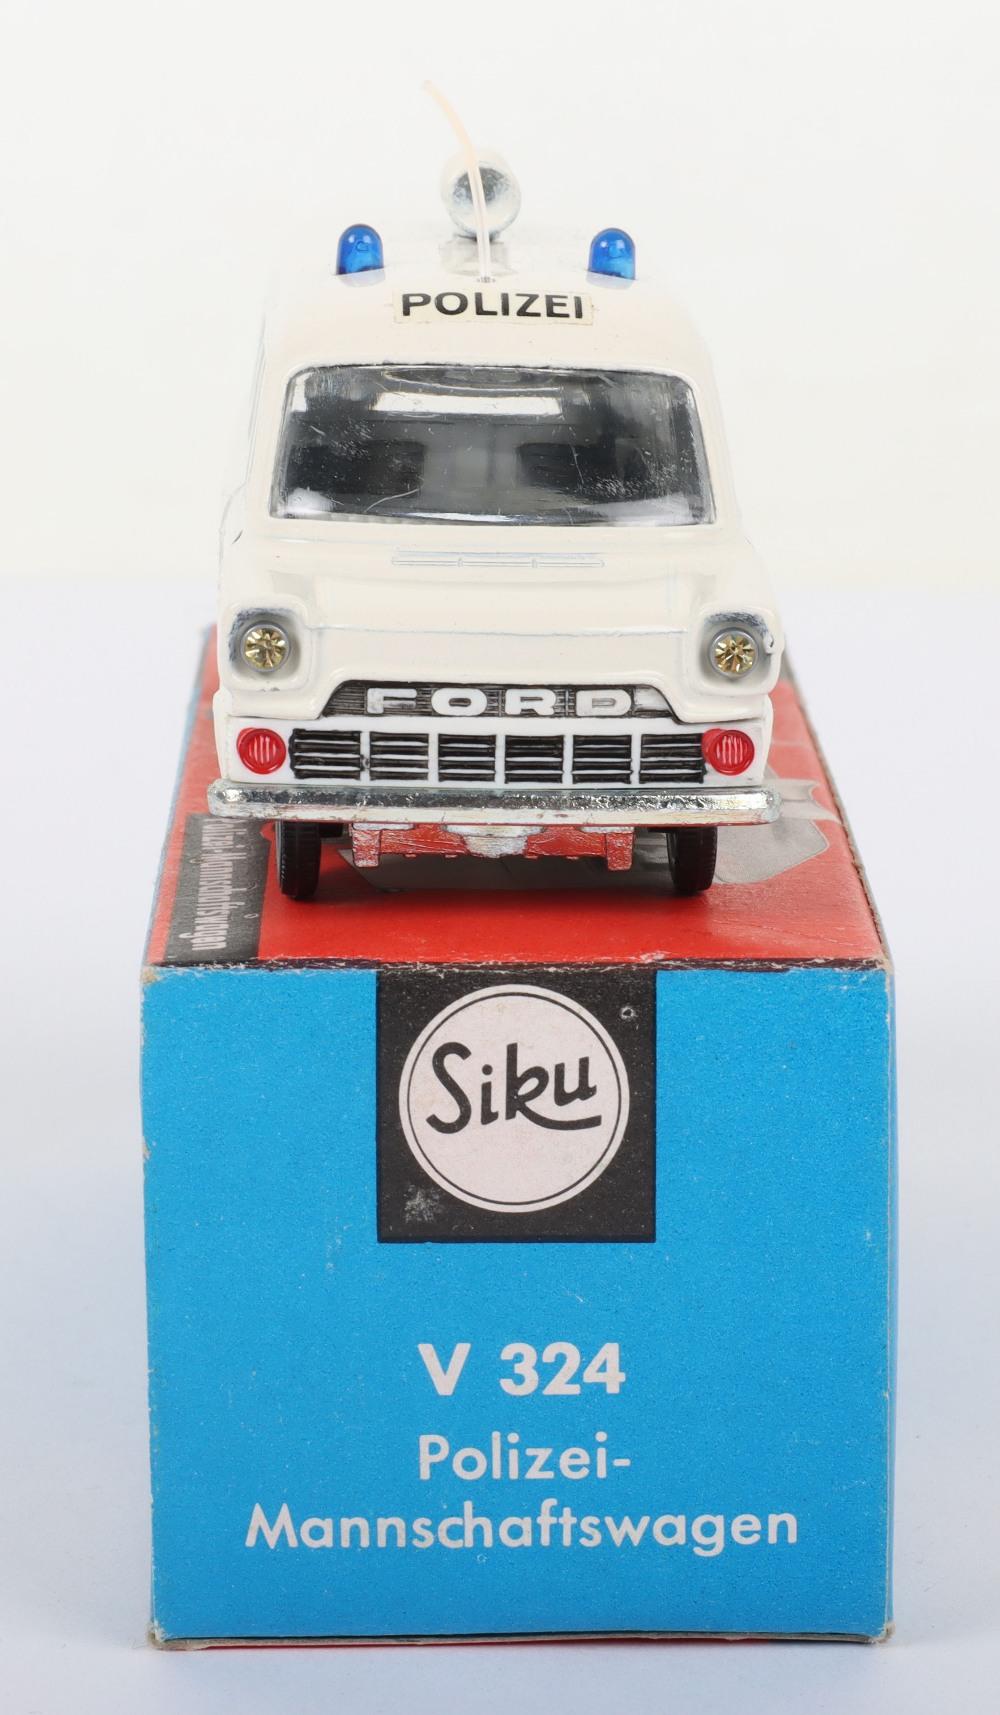 Siku (Germany) V 324 Ford Transit Polizei Van - Image 4 of 5